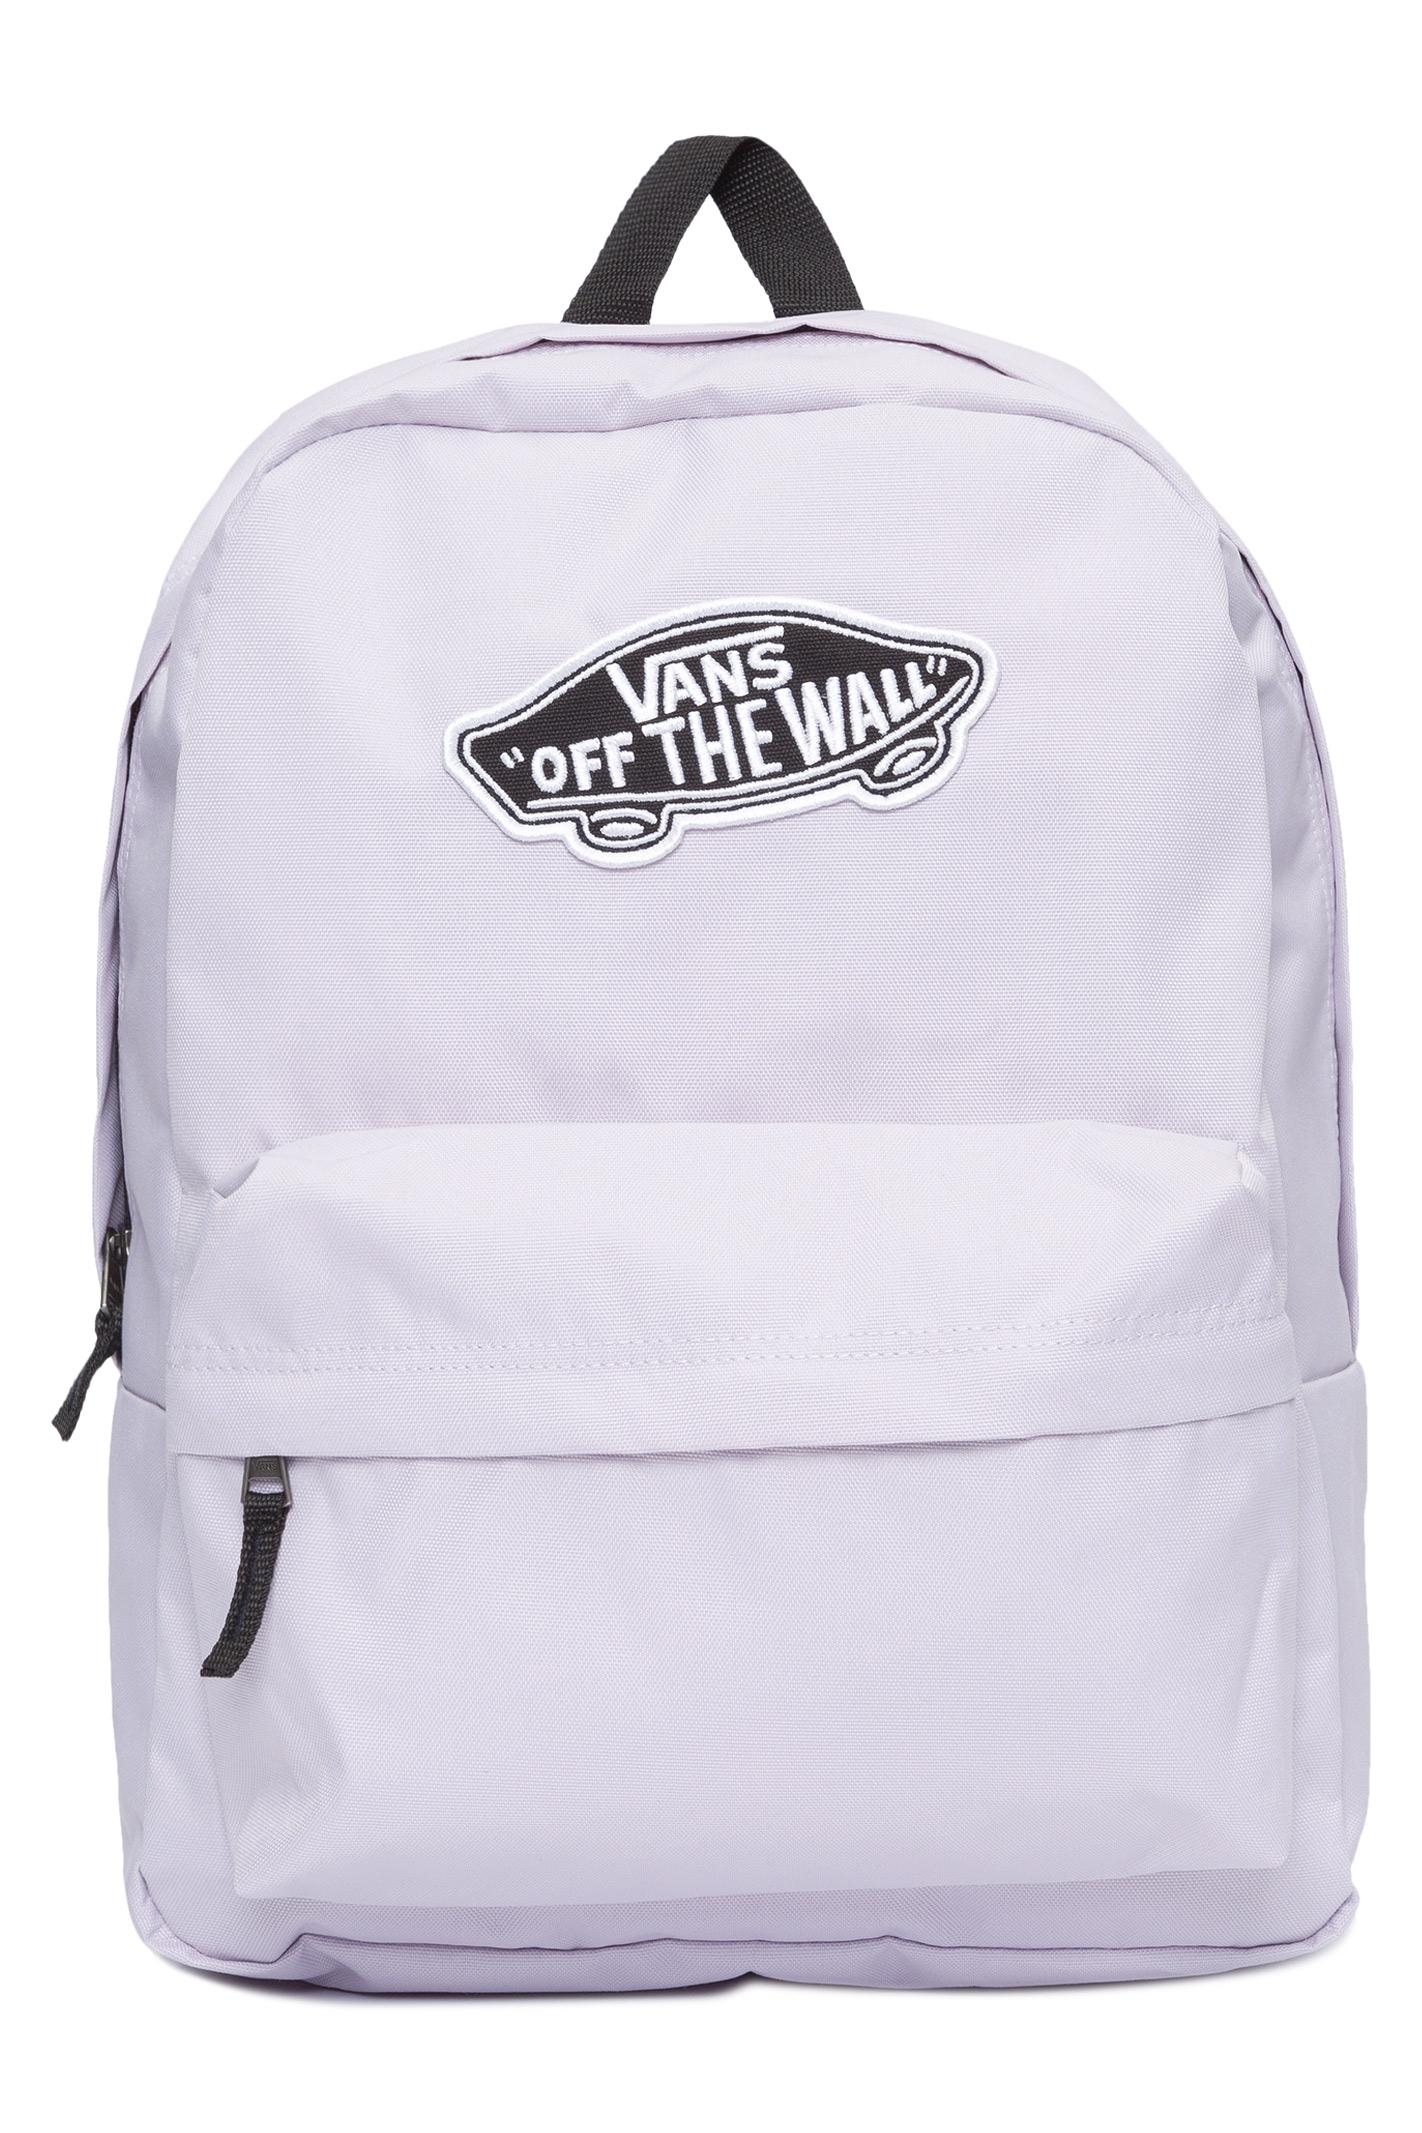 Mochila Wm Realm Backpack